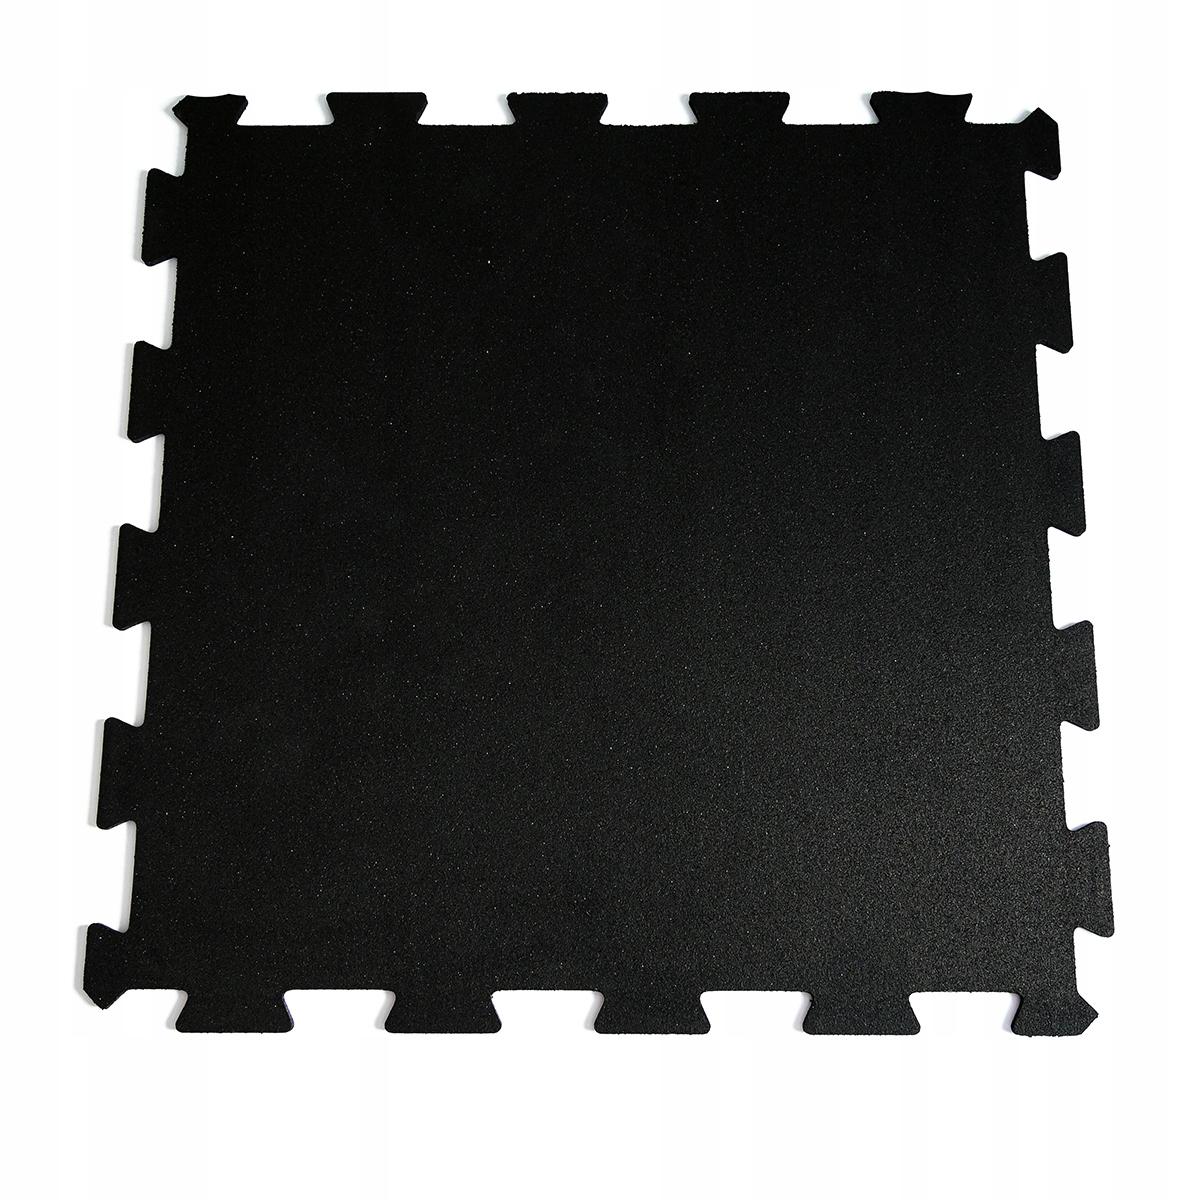 Резиновый коврик ГОЛОВОЛОМКИ SLICE 98x98x15 мм БАССЕЙН